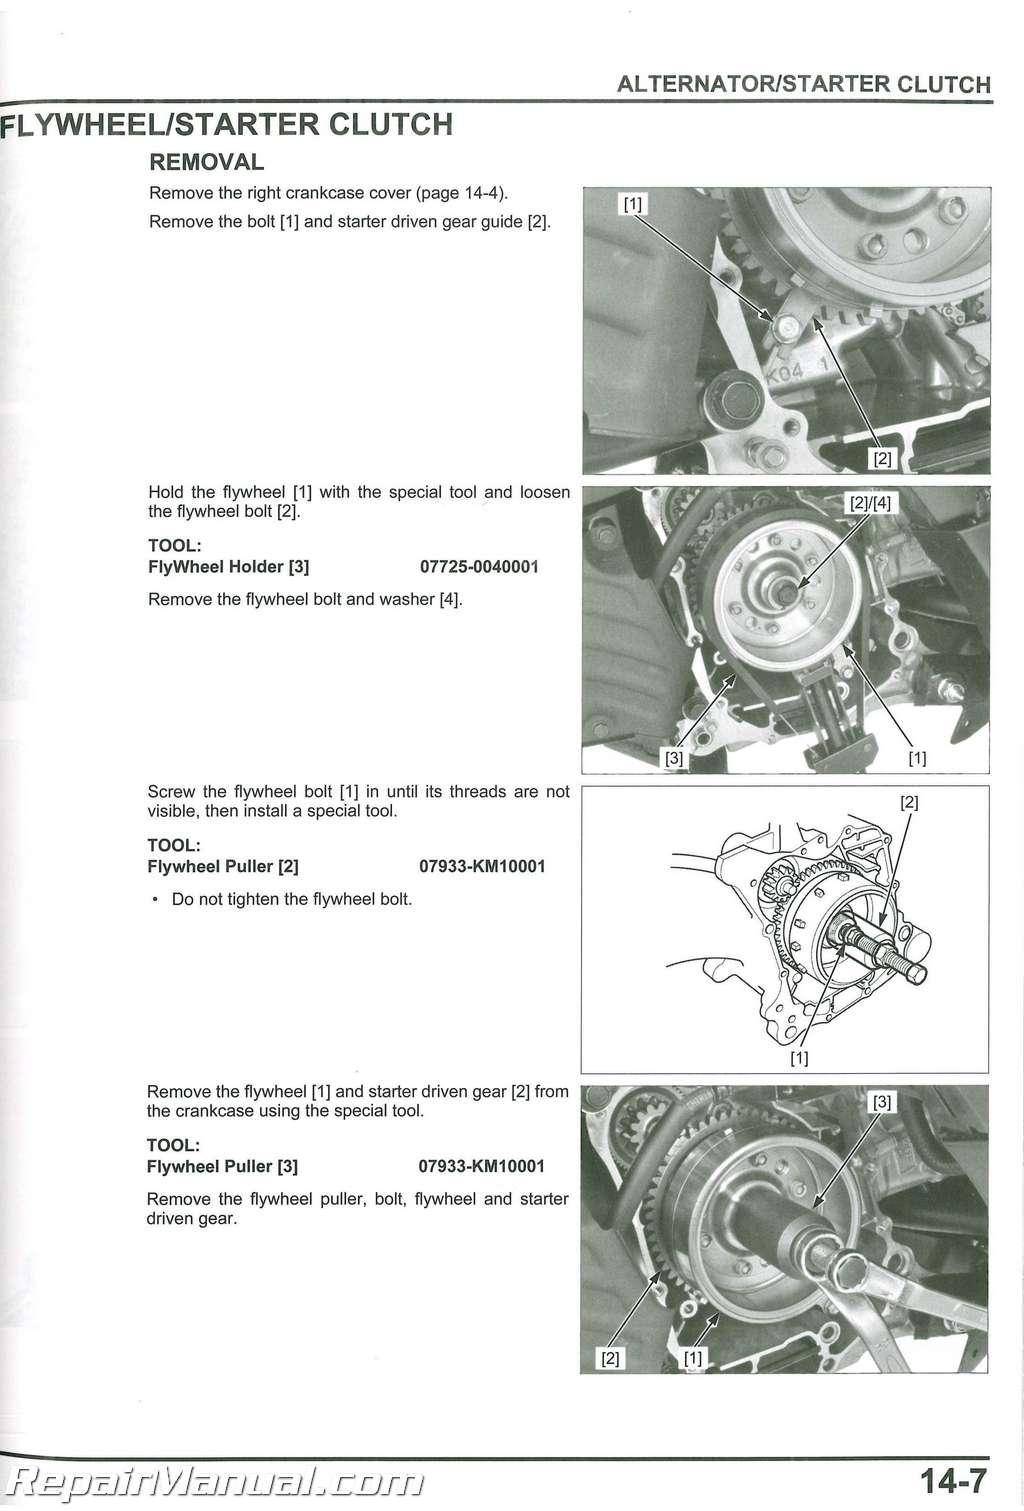 Honda manual Repair Free